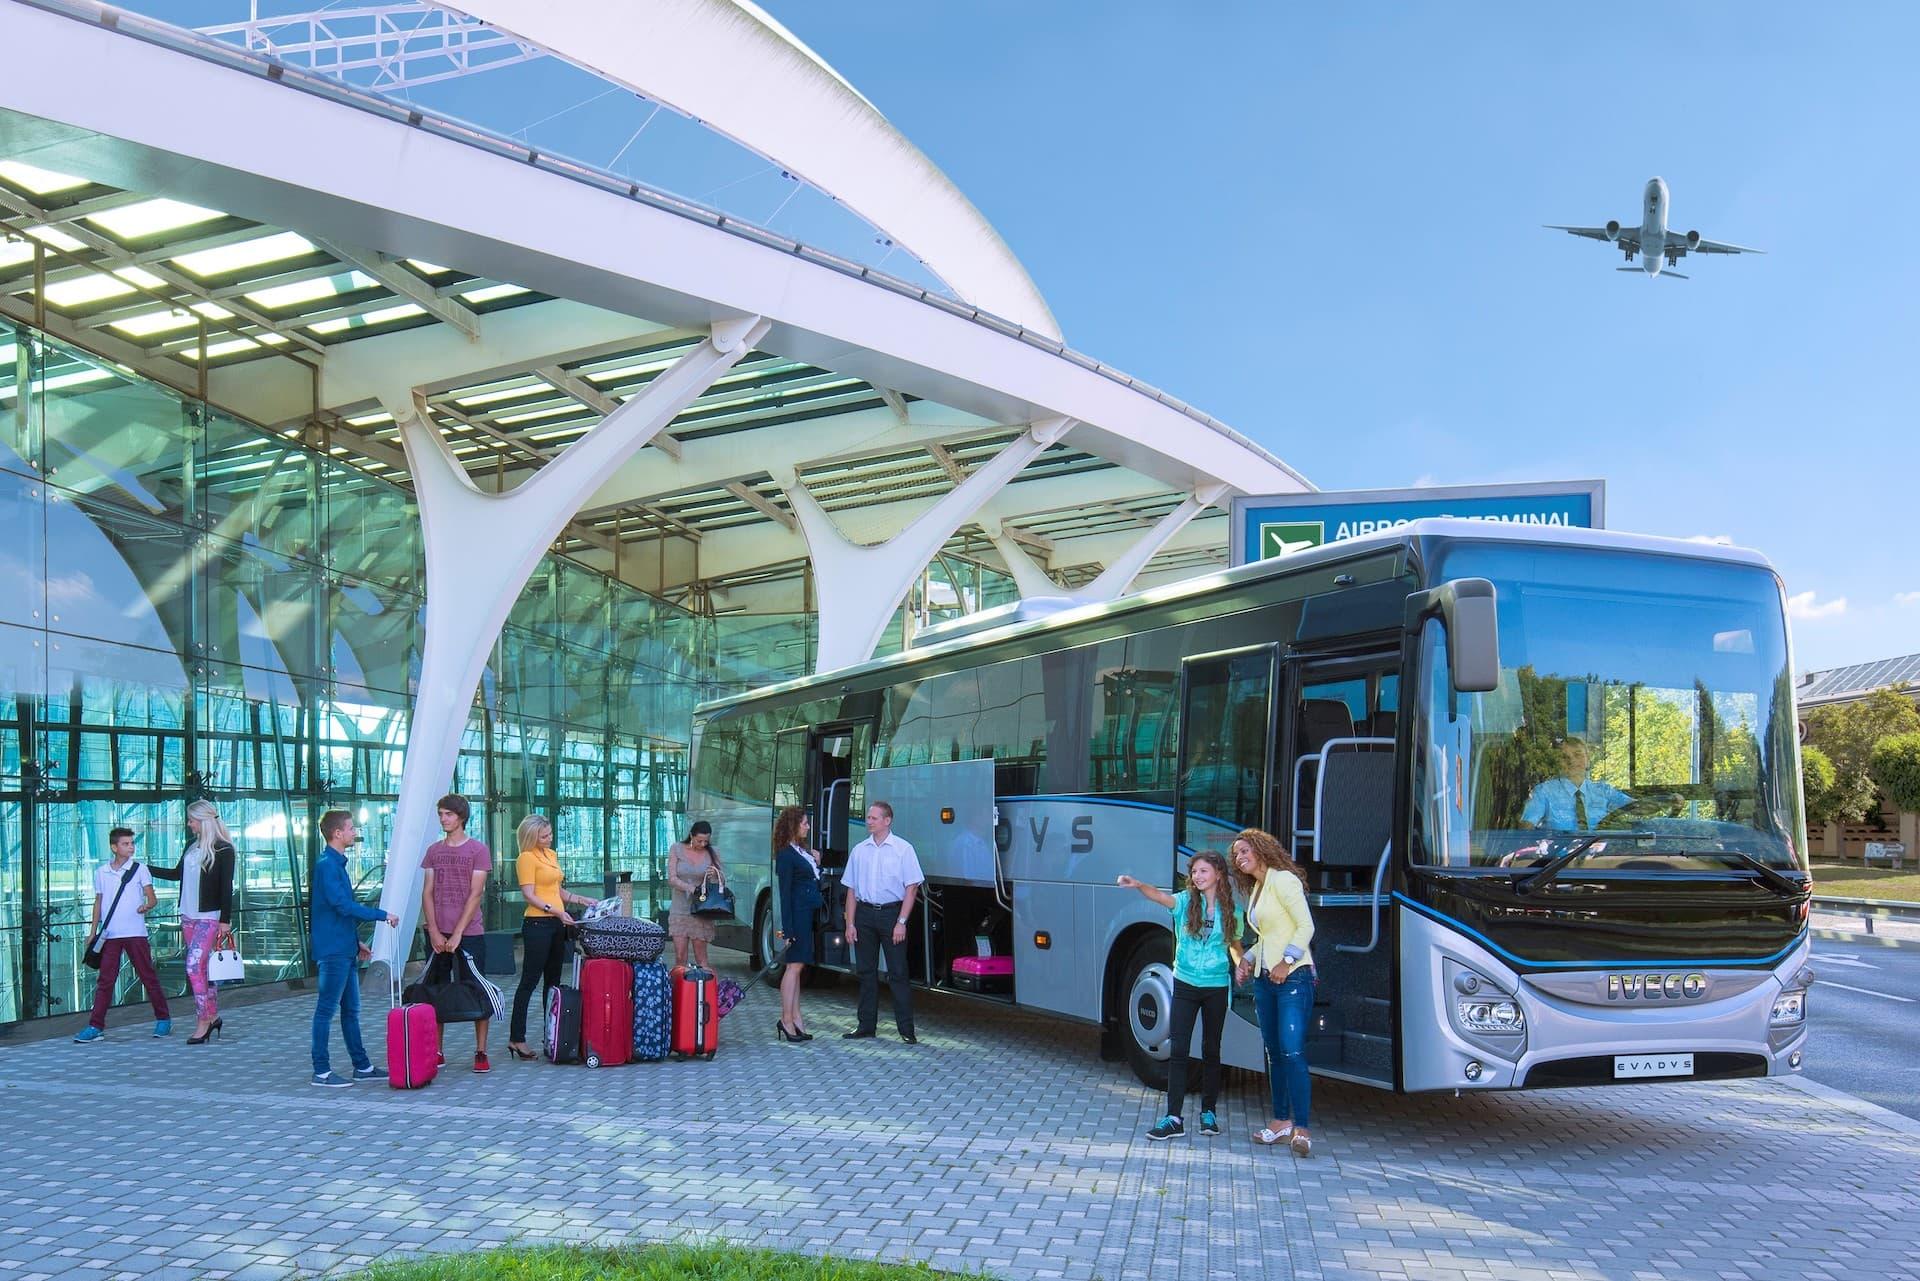 evadys aeroporto turismo